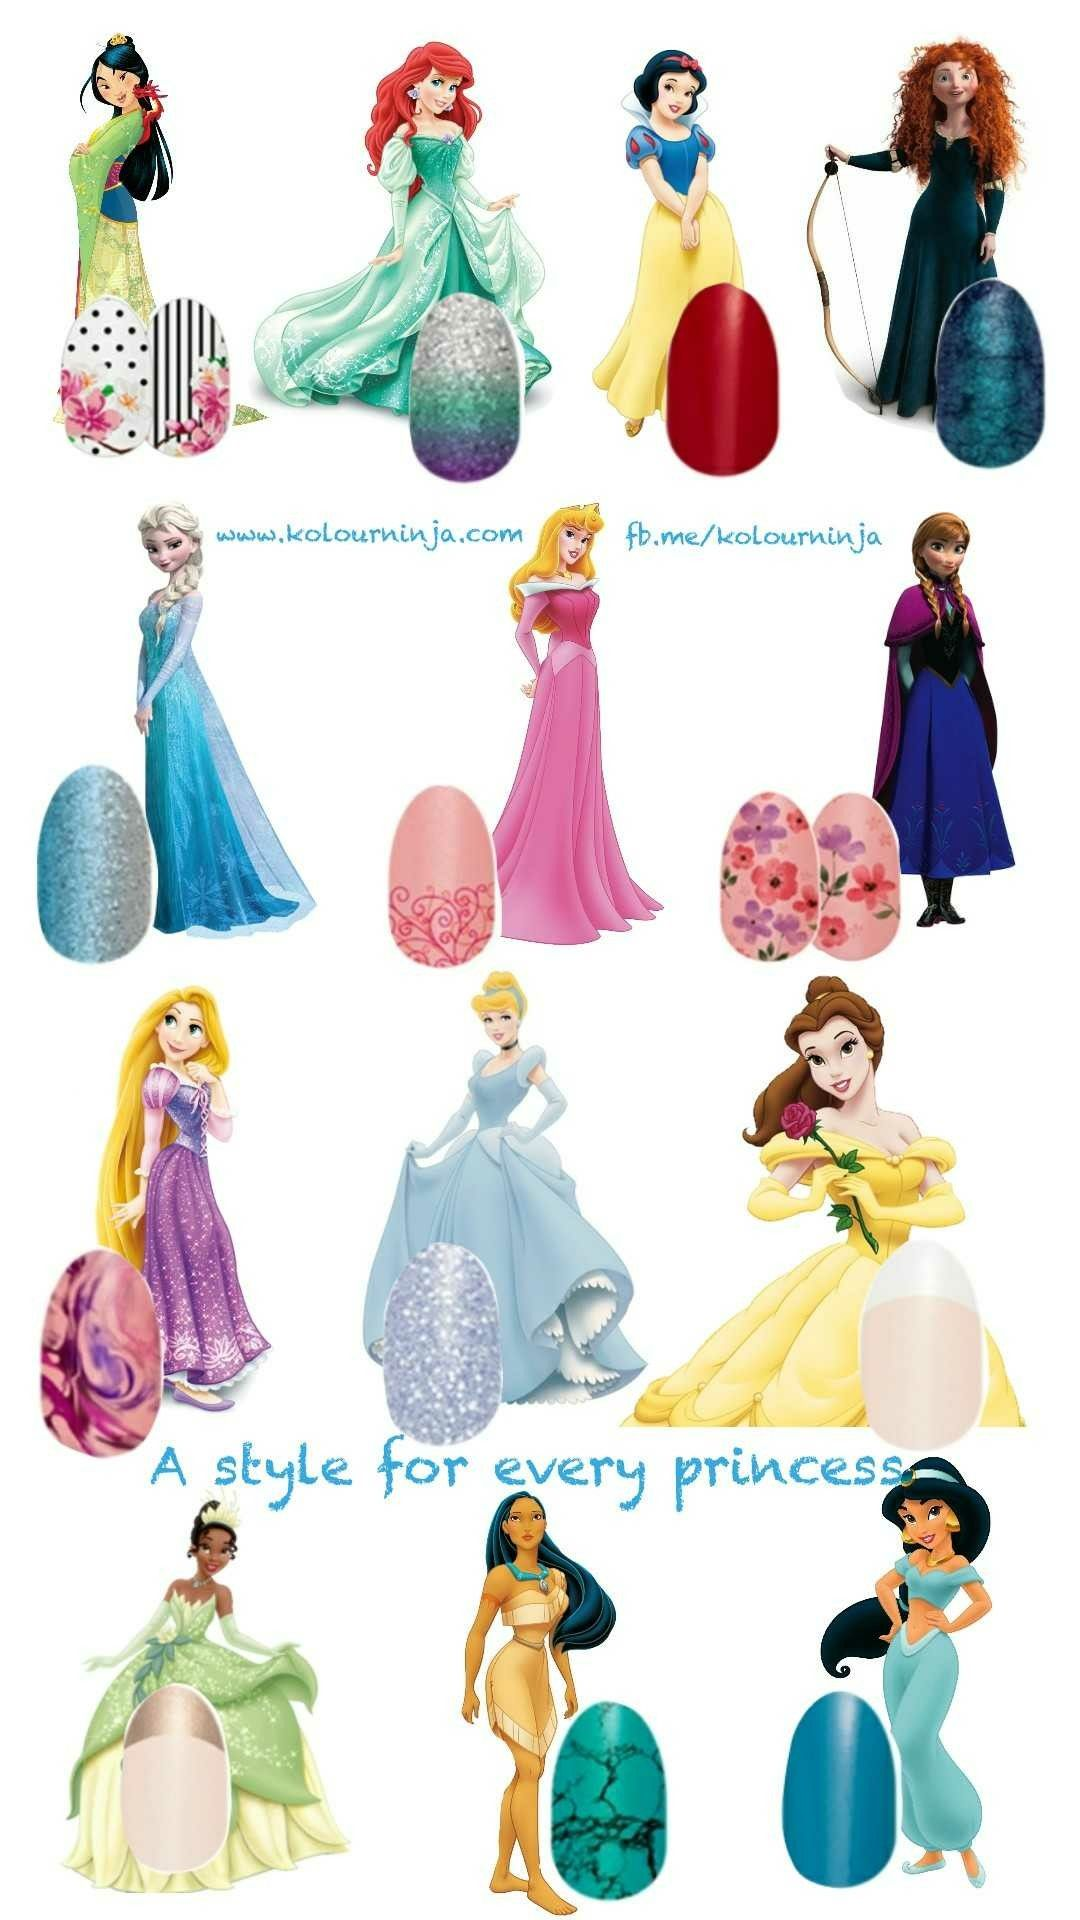 fb.me/kolourninja A Color Street style for every princess. #nails ...